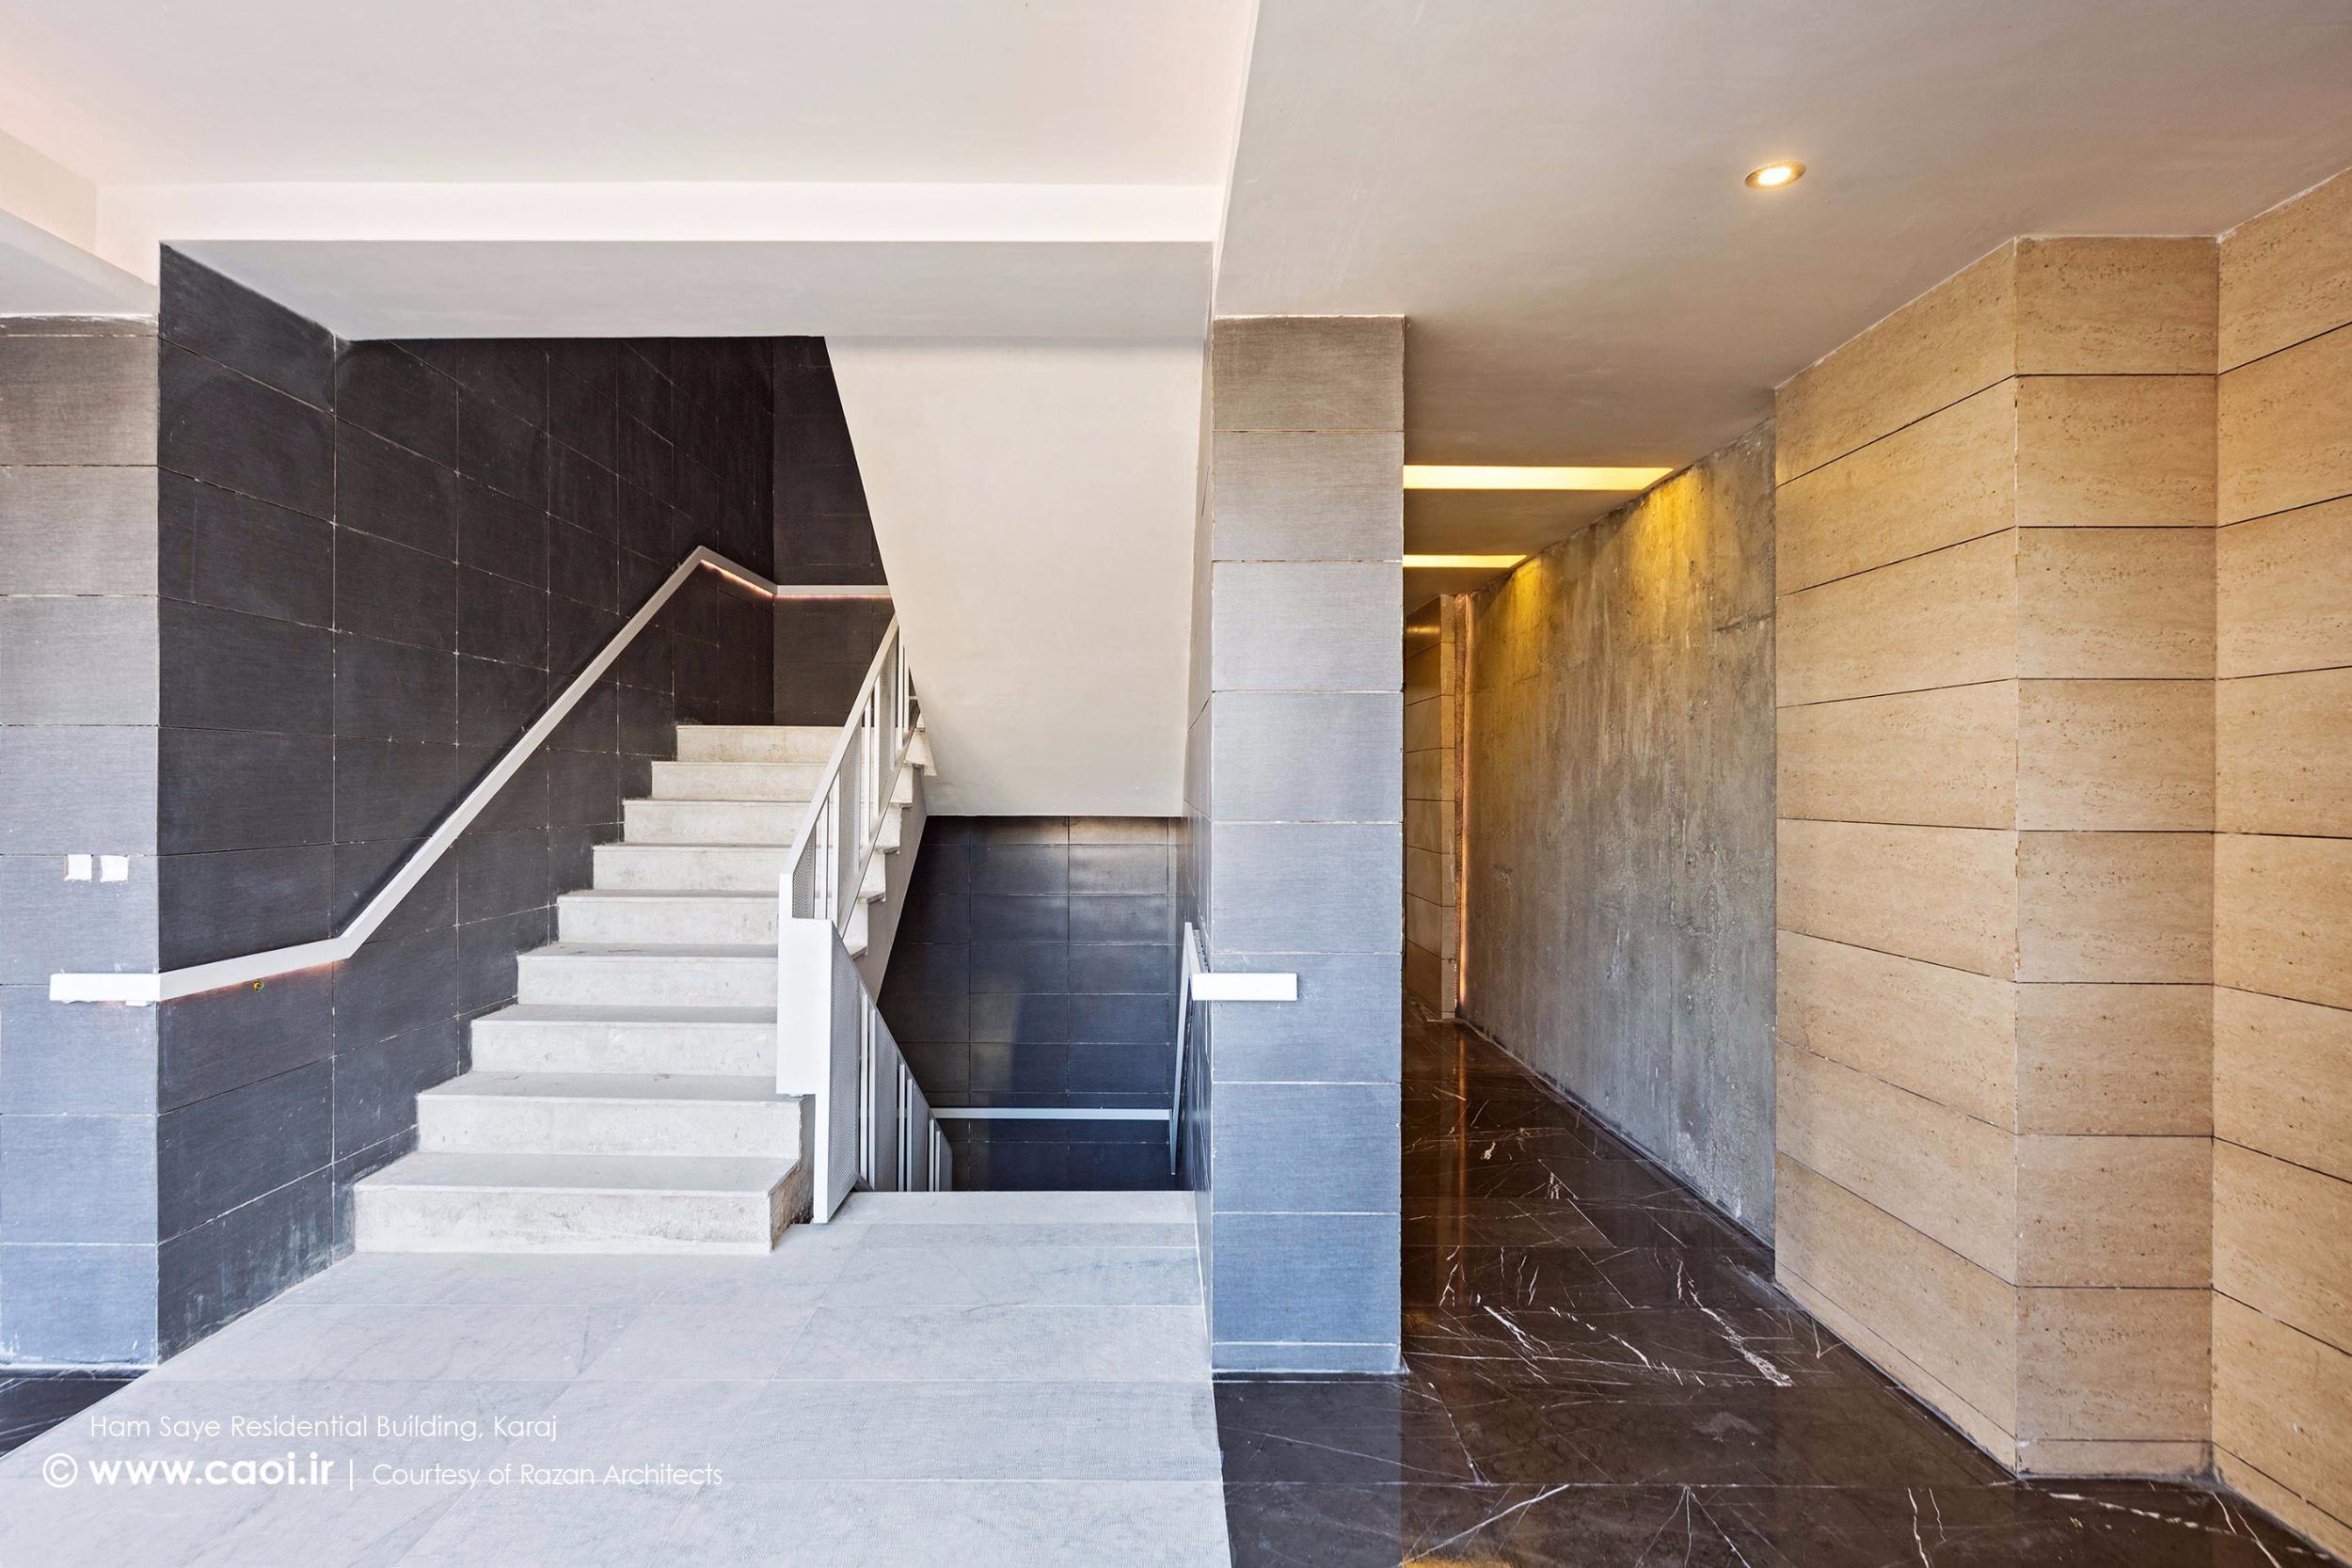 Ham_Saye_Residential_Building_in_Karaj_by_Razan_Architects__16_